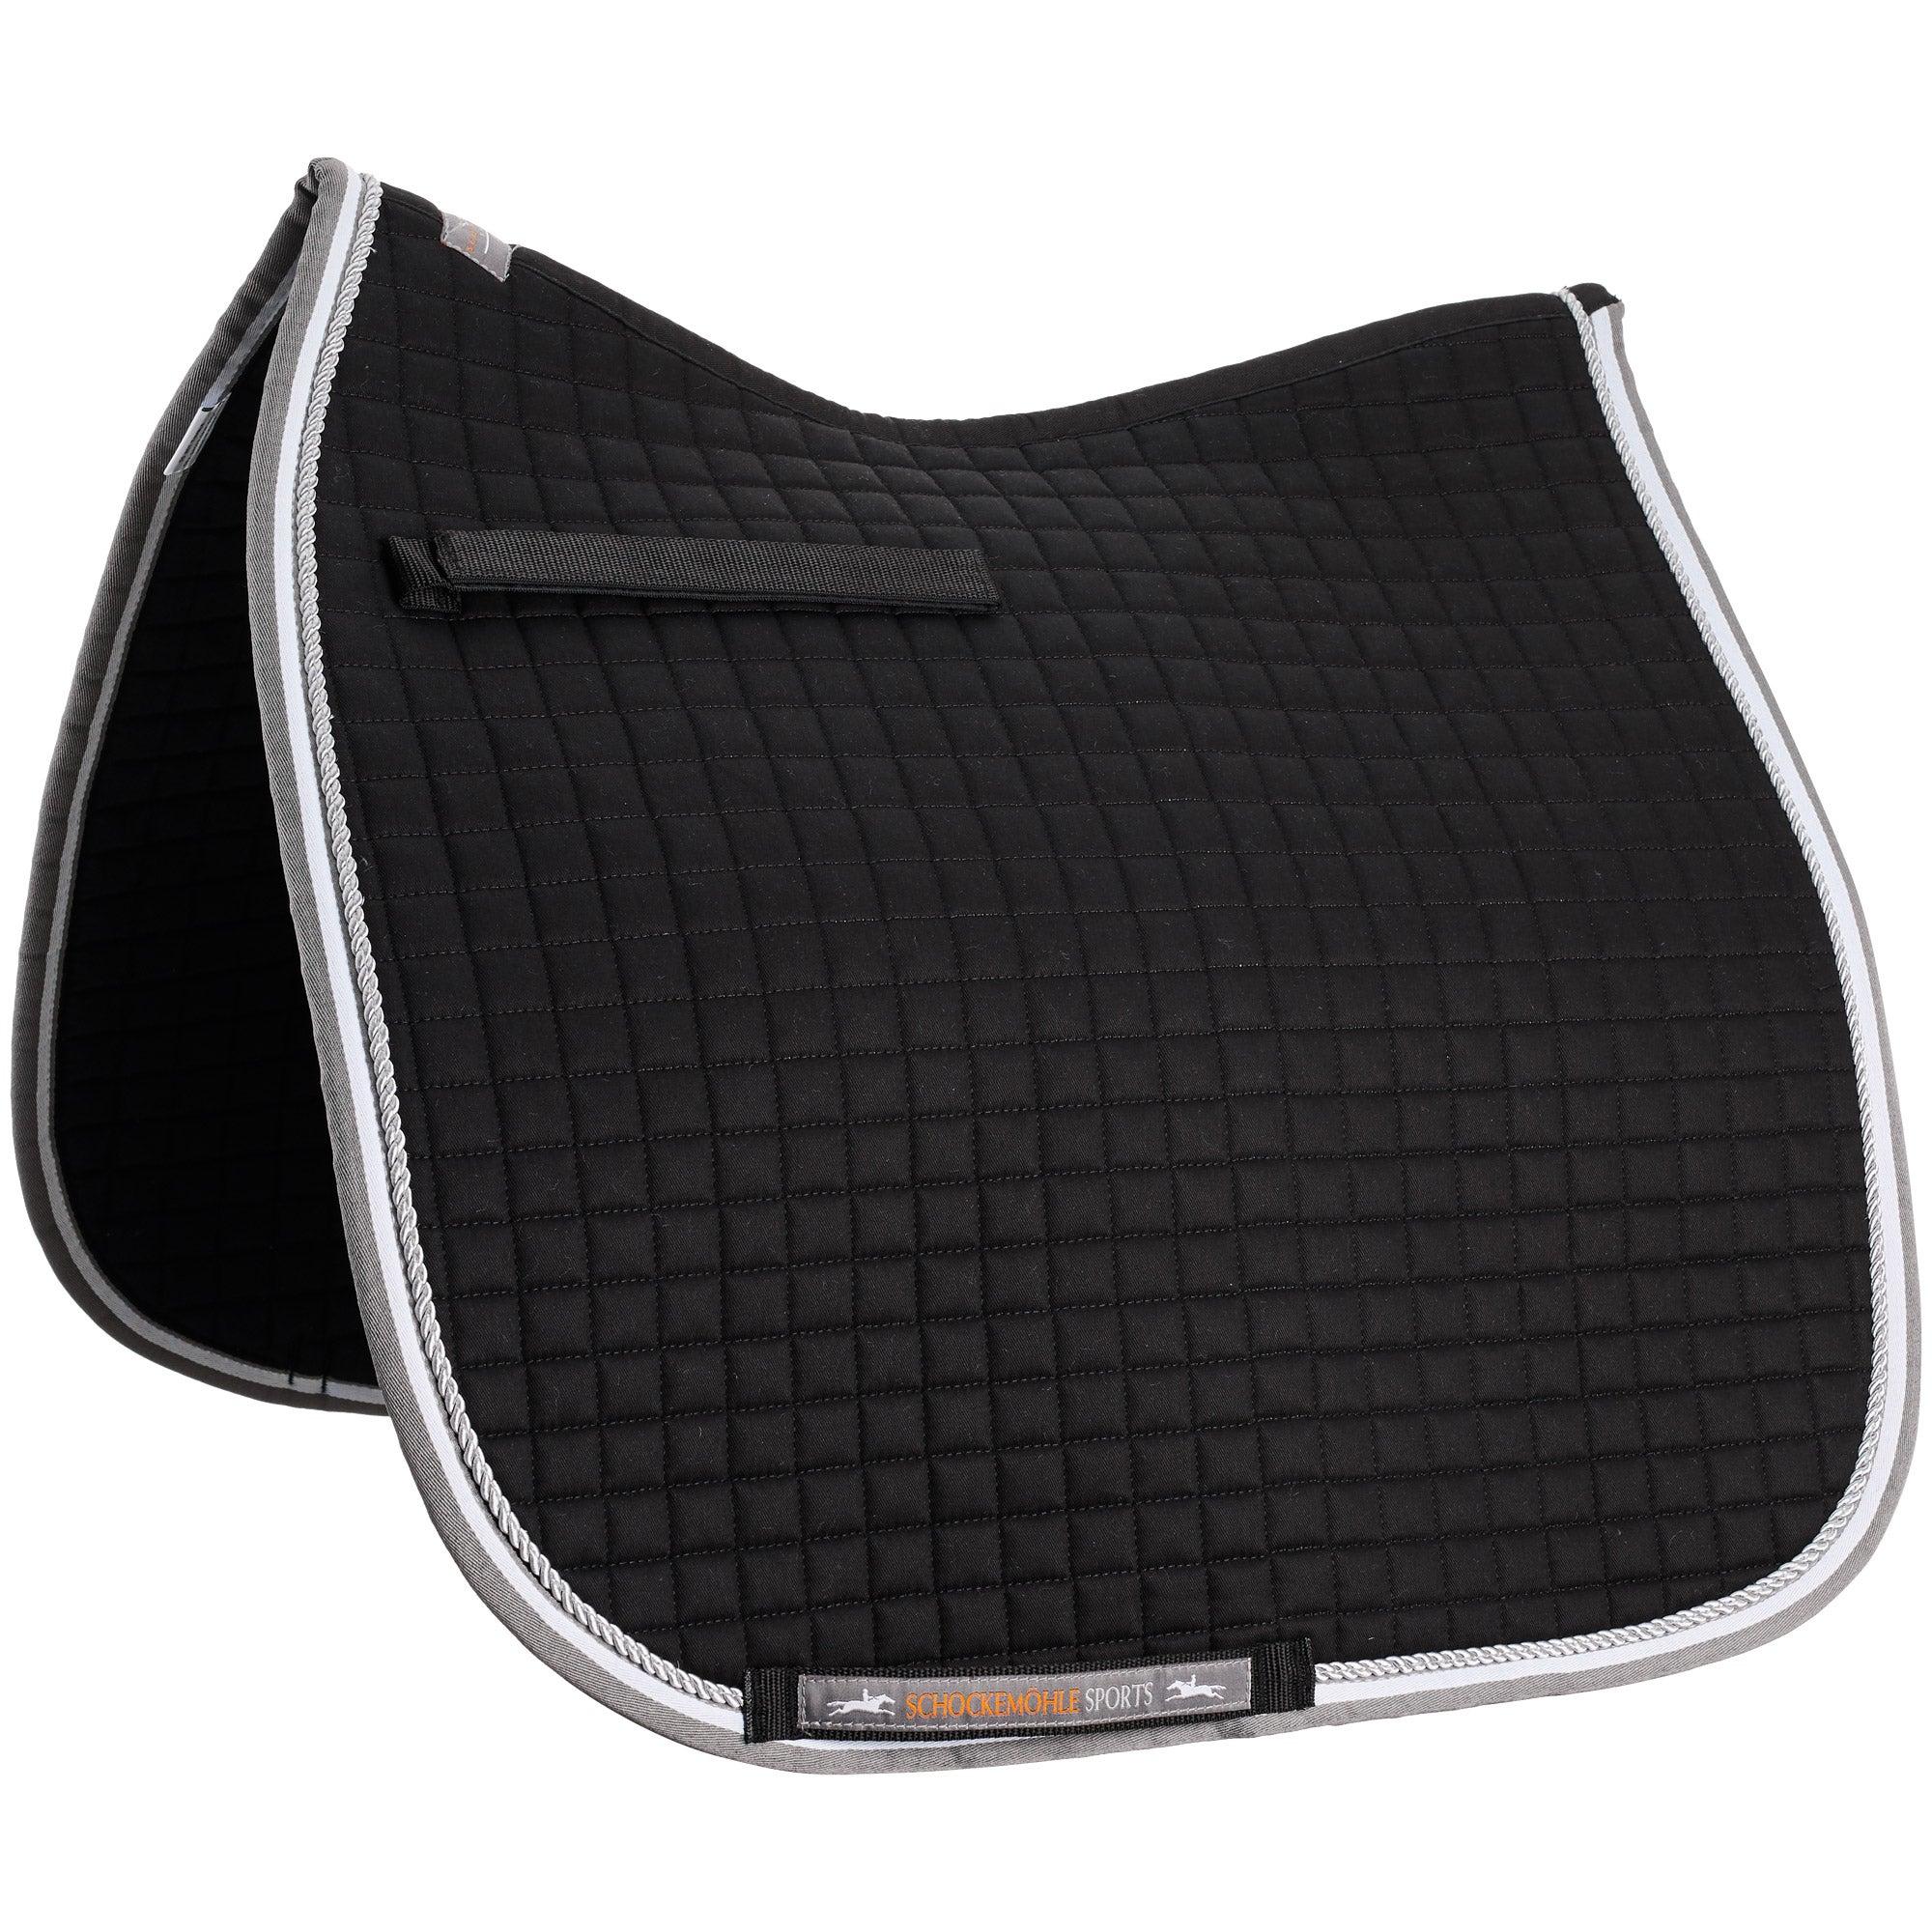 Schockemohle Neo Star Dressage Saddle Pad